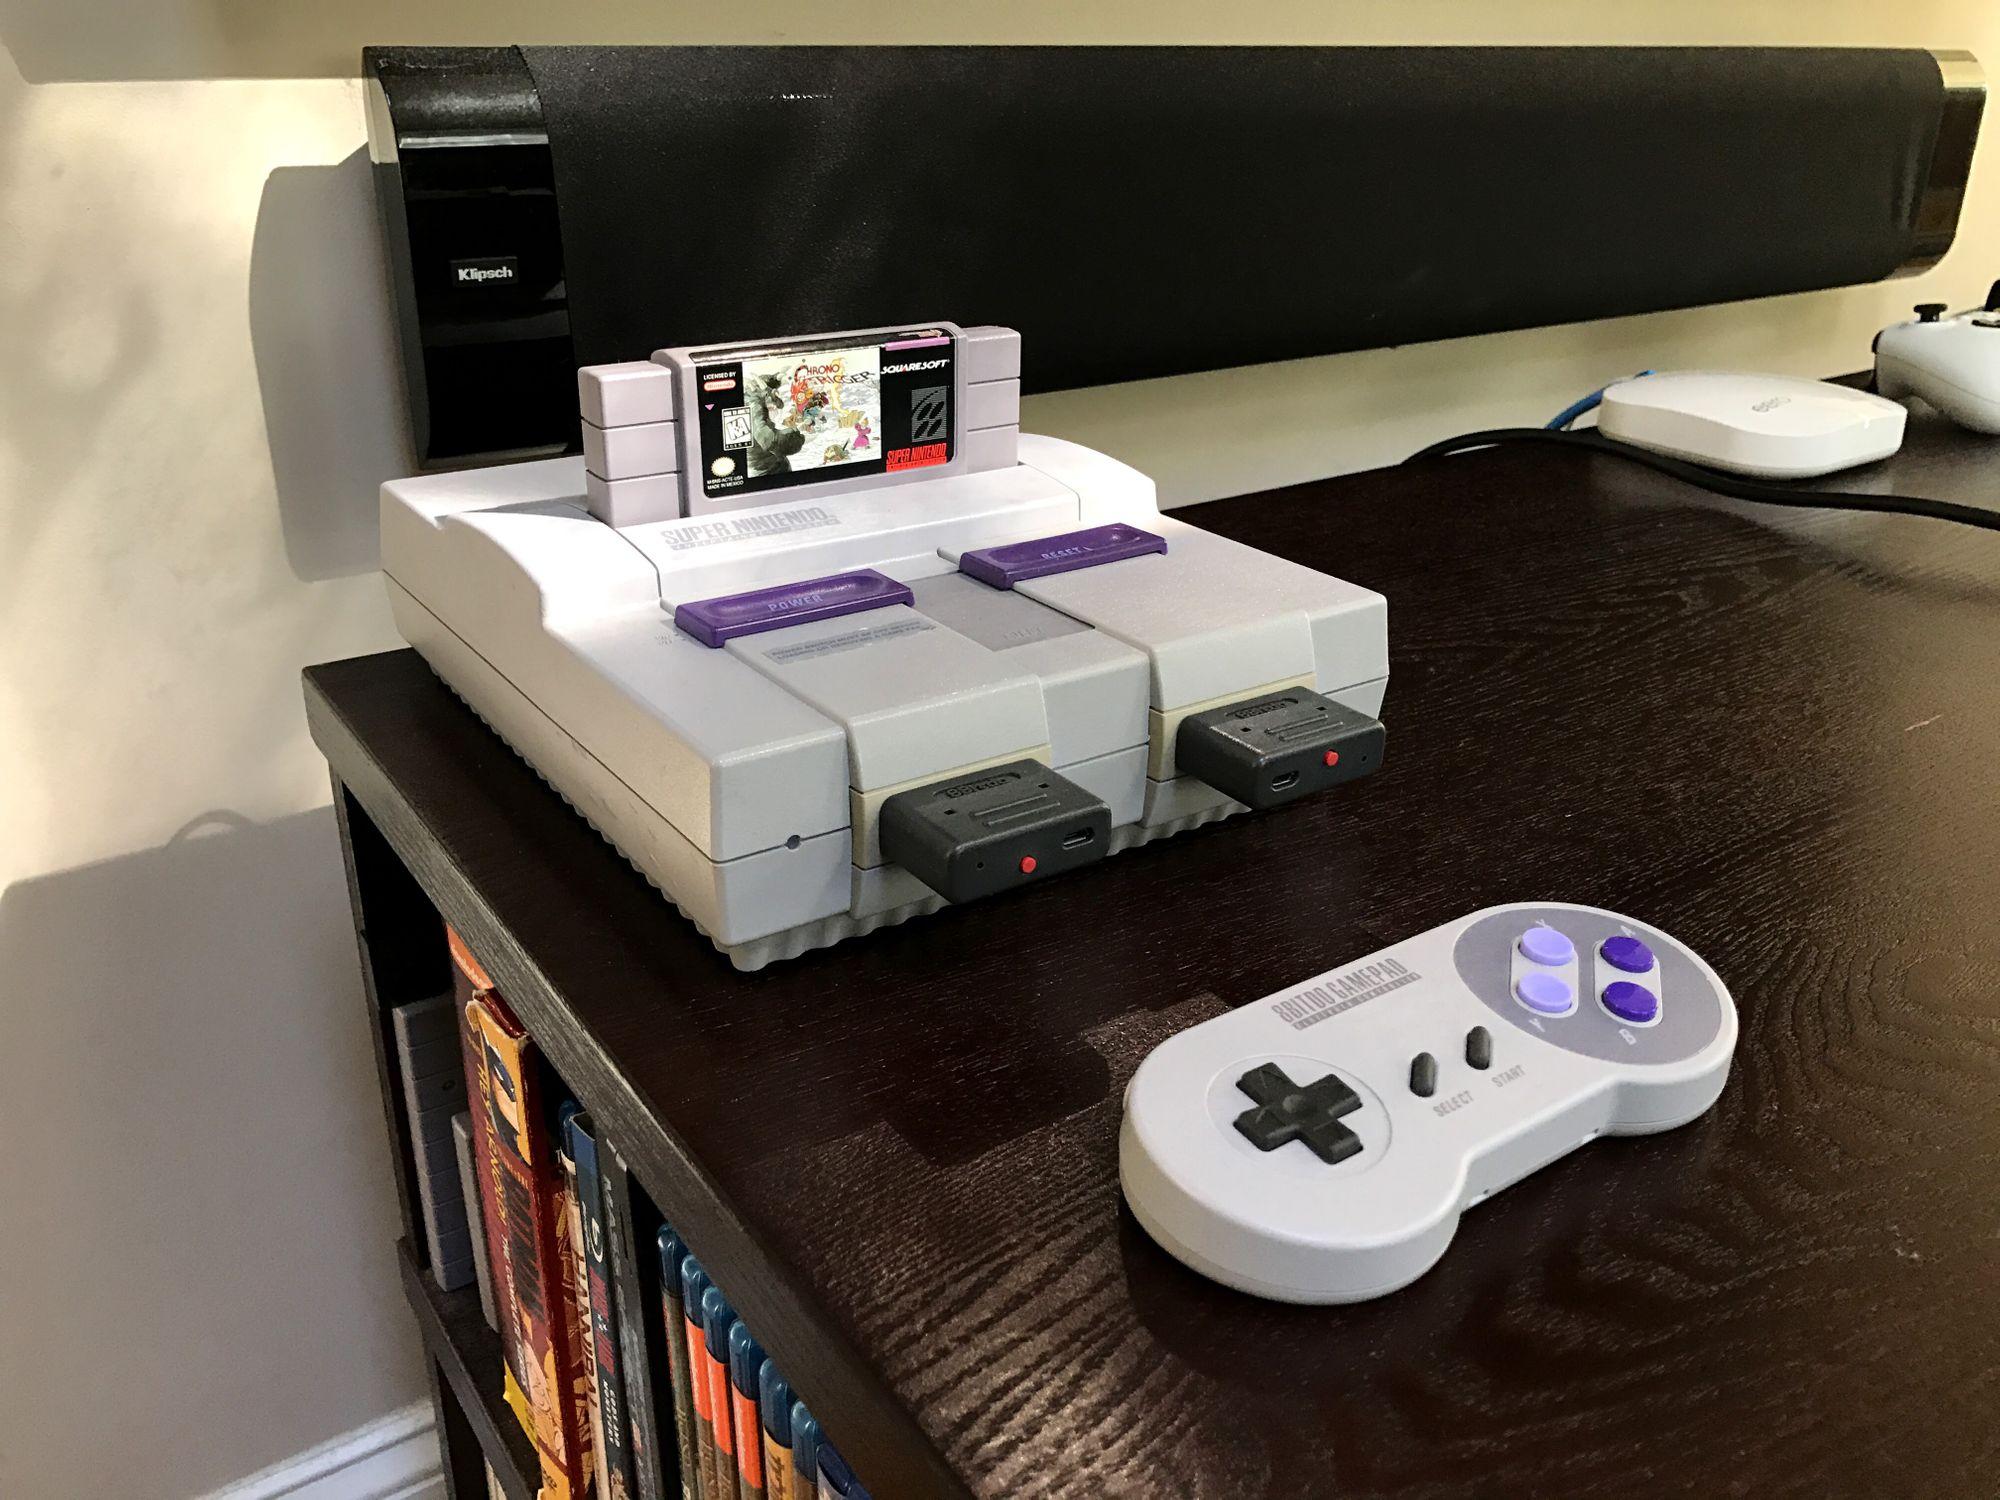 Taking the Super Nintendo in to the modern era